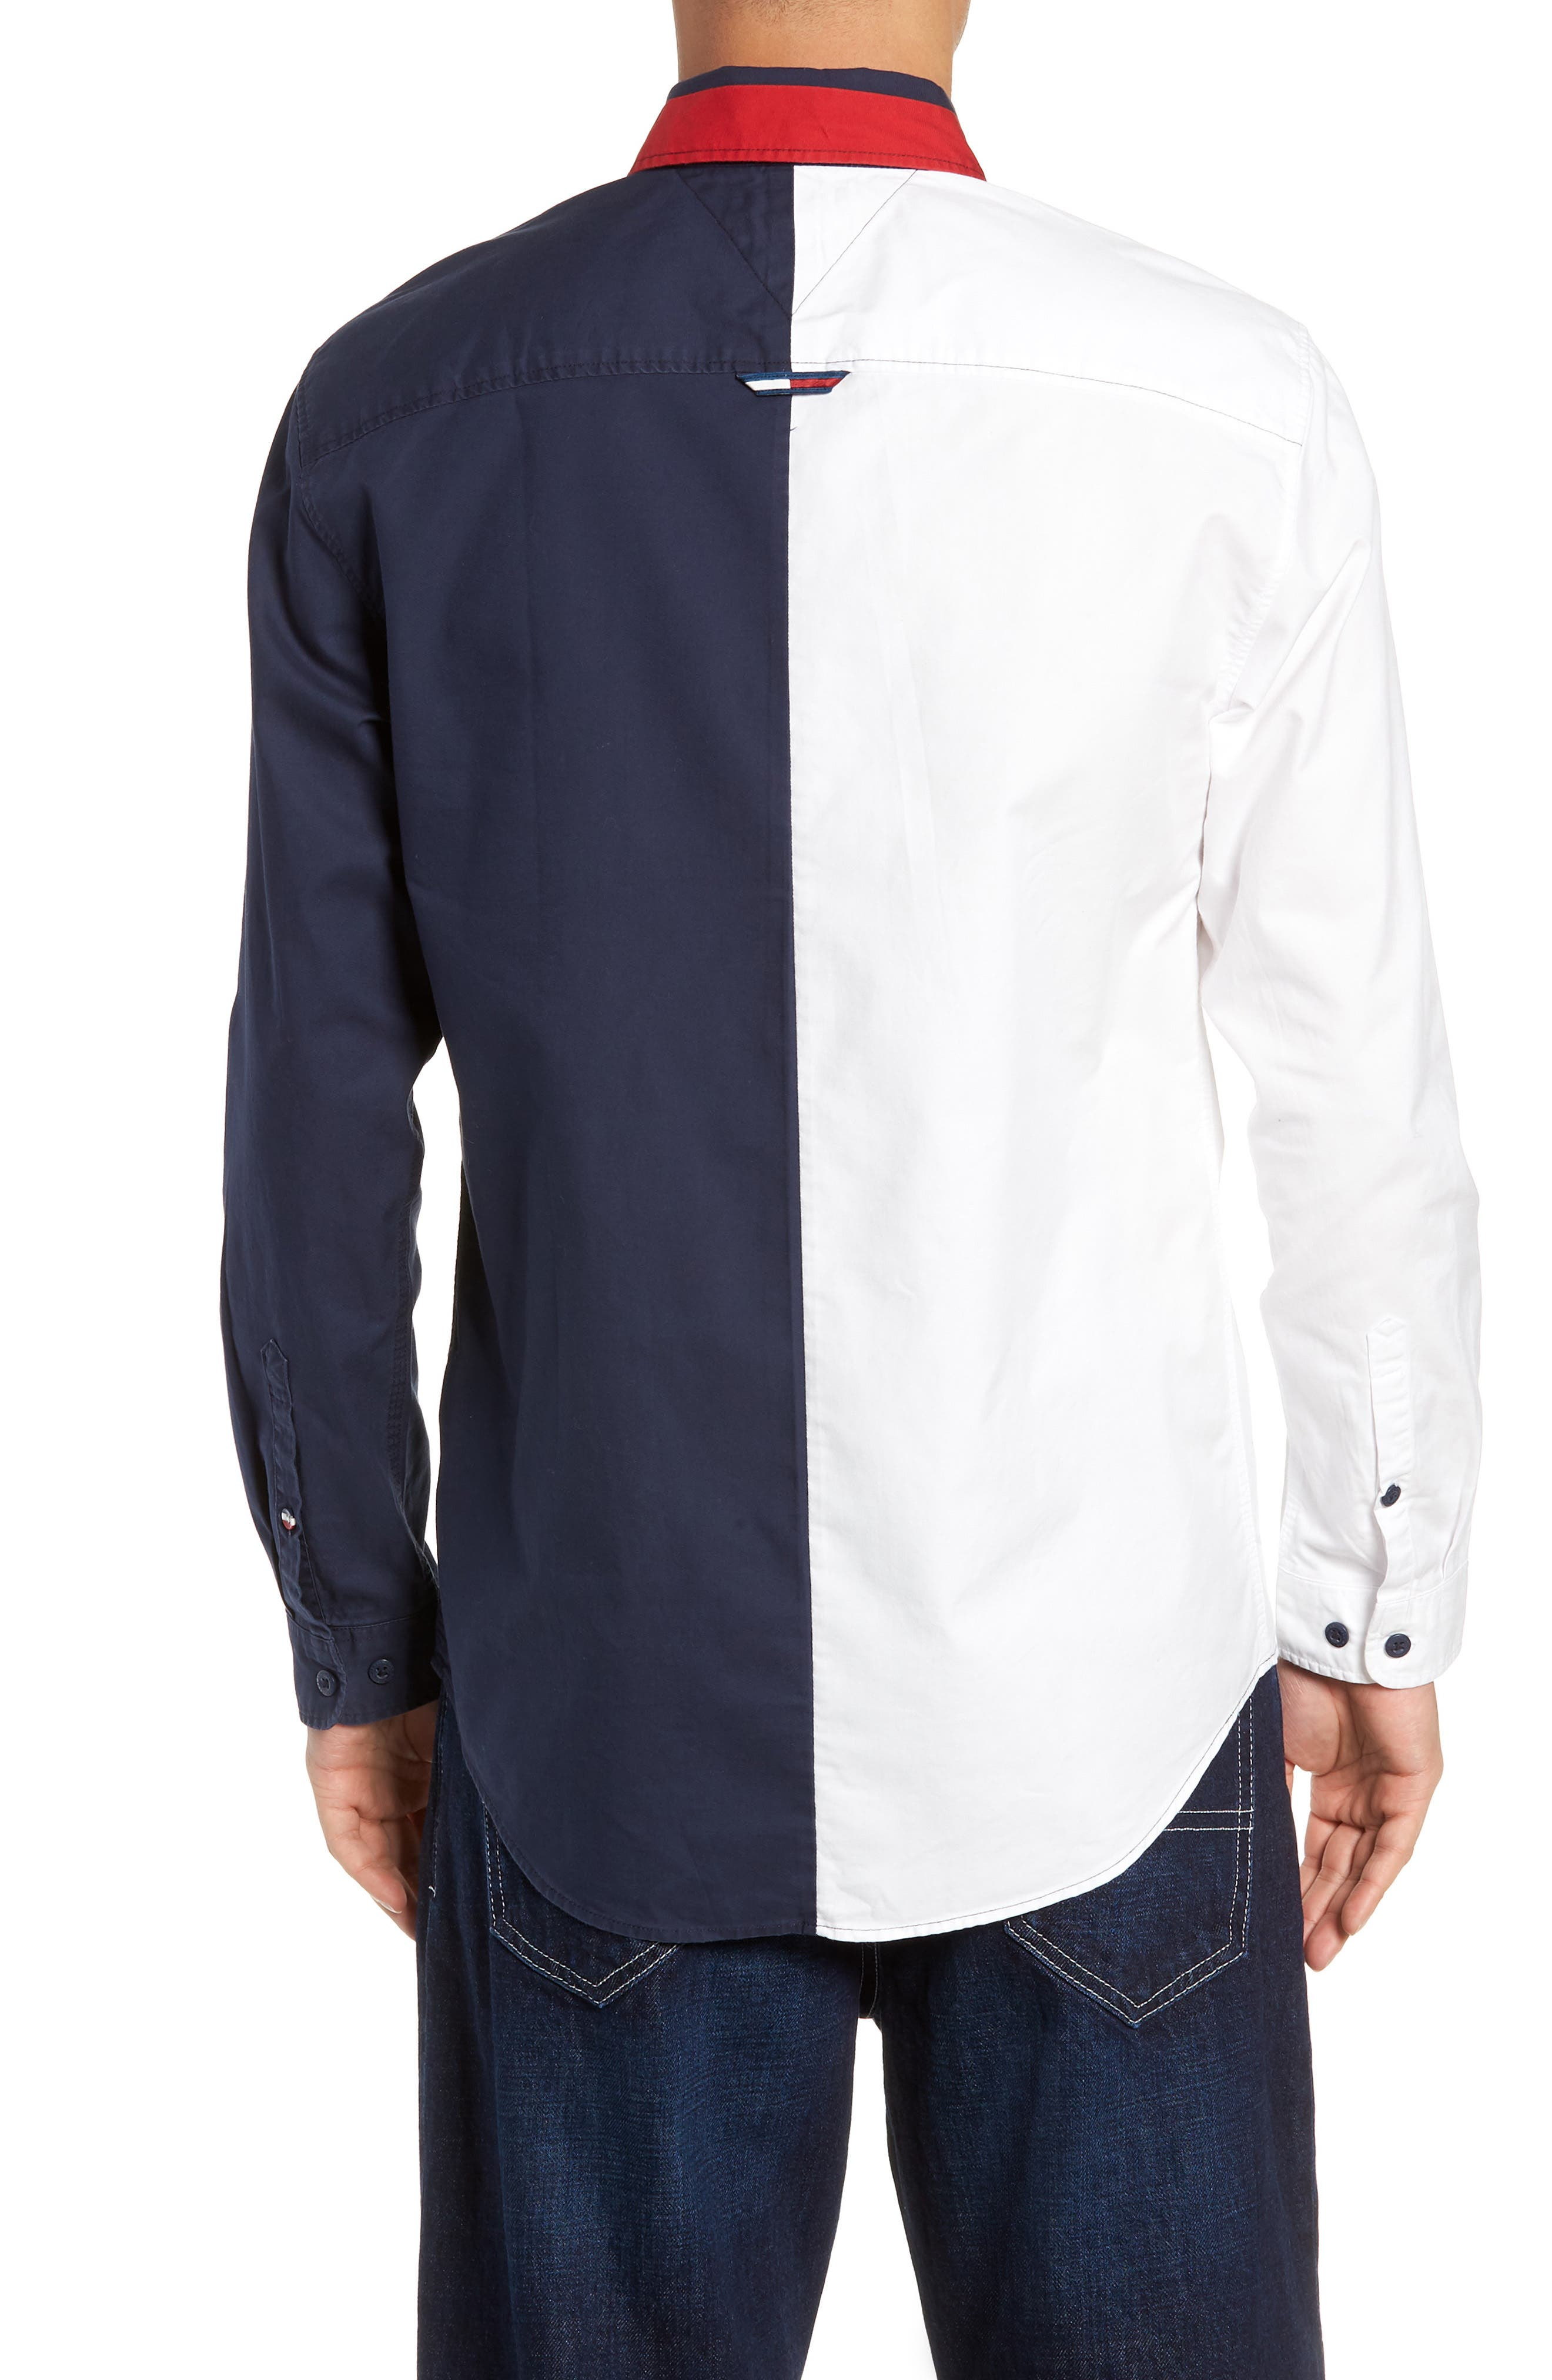 Half & Half Shirt,                             Alternate thumbnail 3, color,                             CLASSIC WHITE / BLACK IRIS